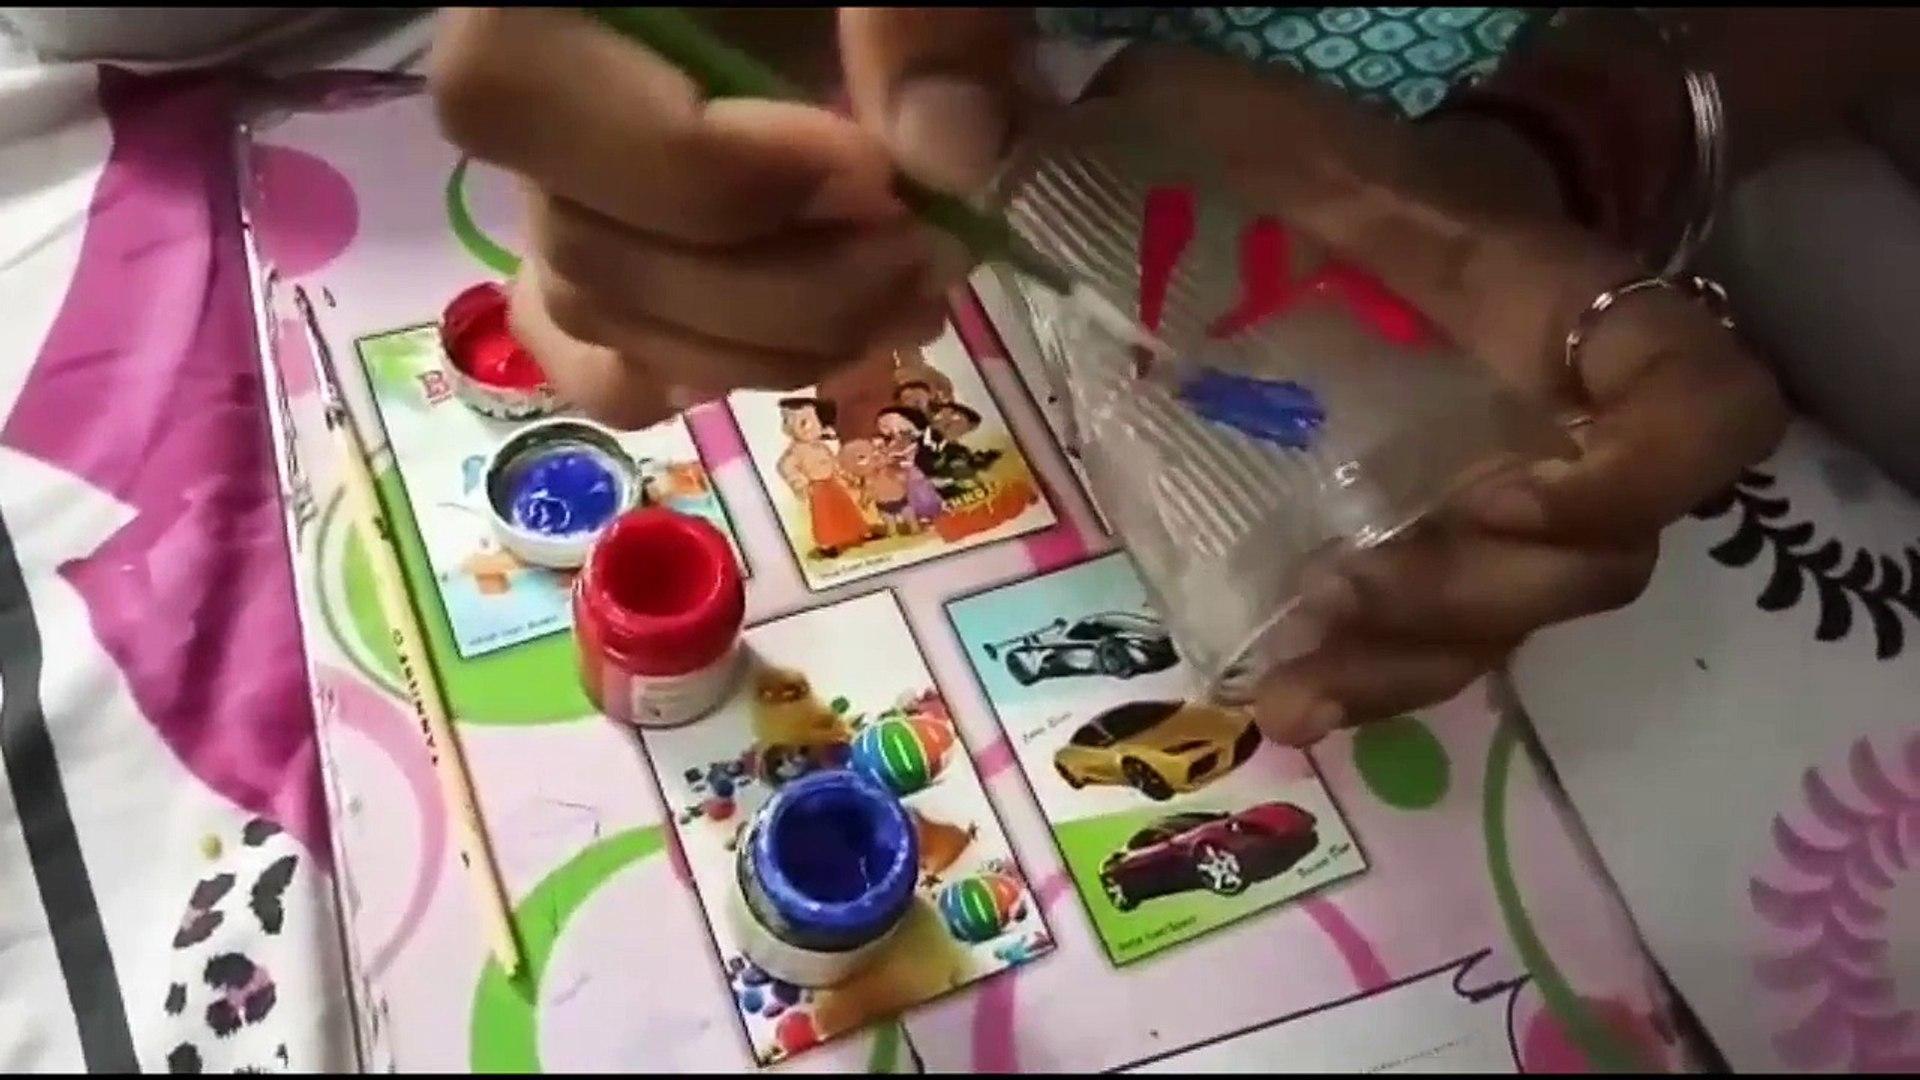 DIY - Make Designer Glass at Home - Kids Creative Activity